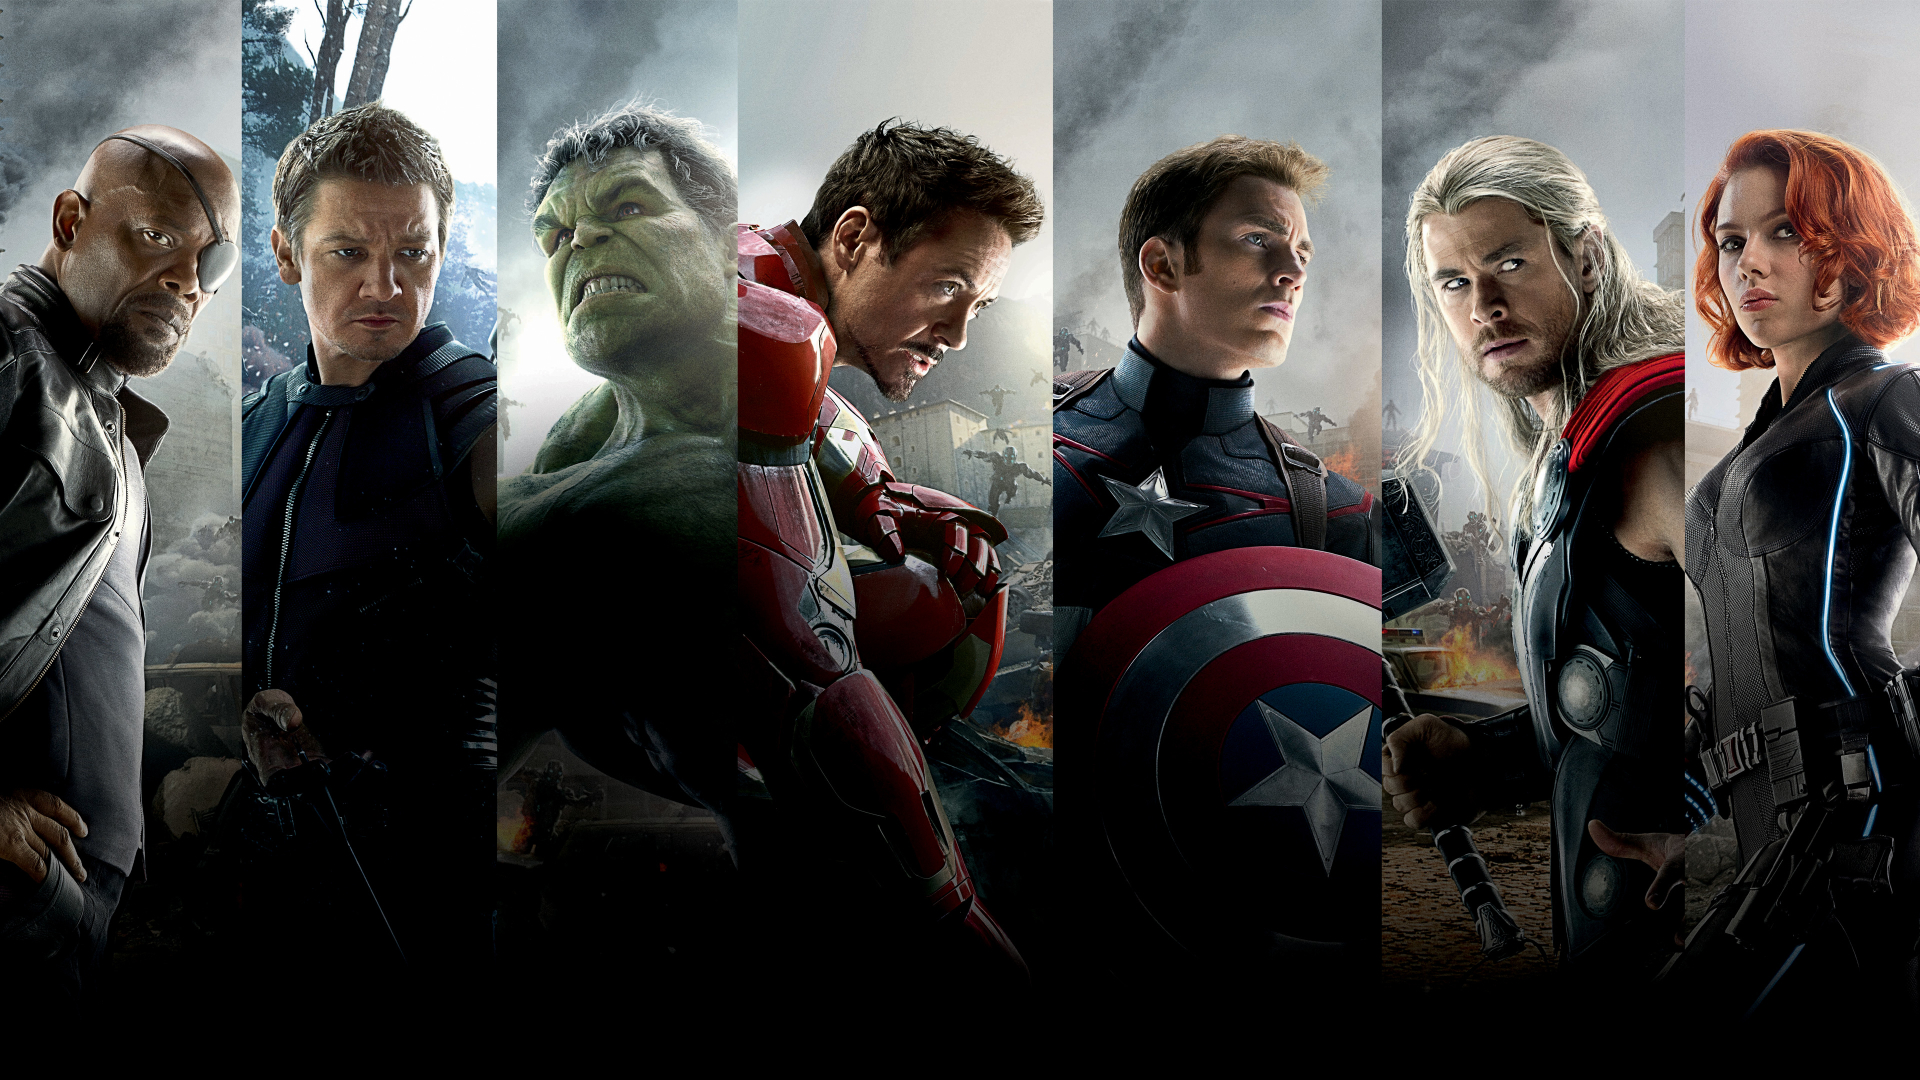 The Avengers Rooleissa